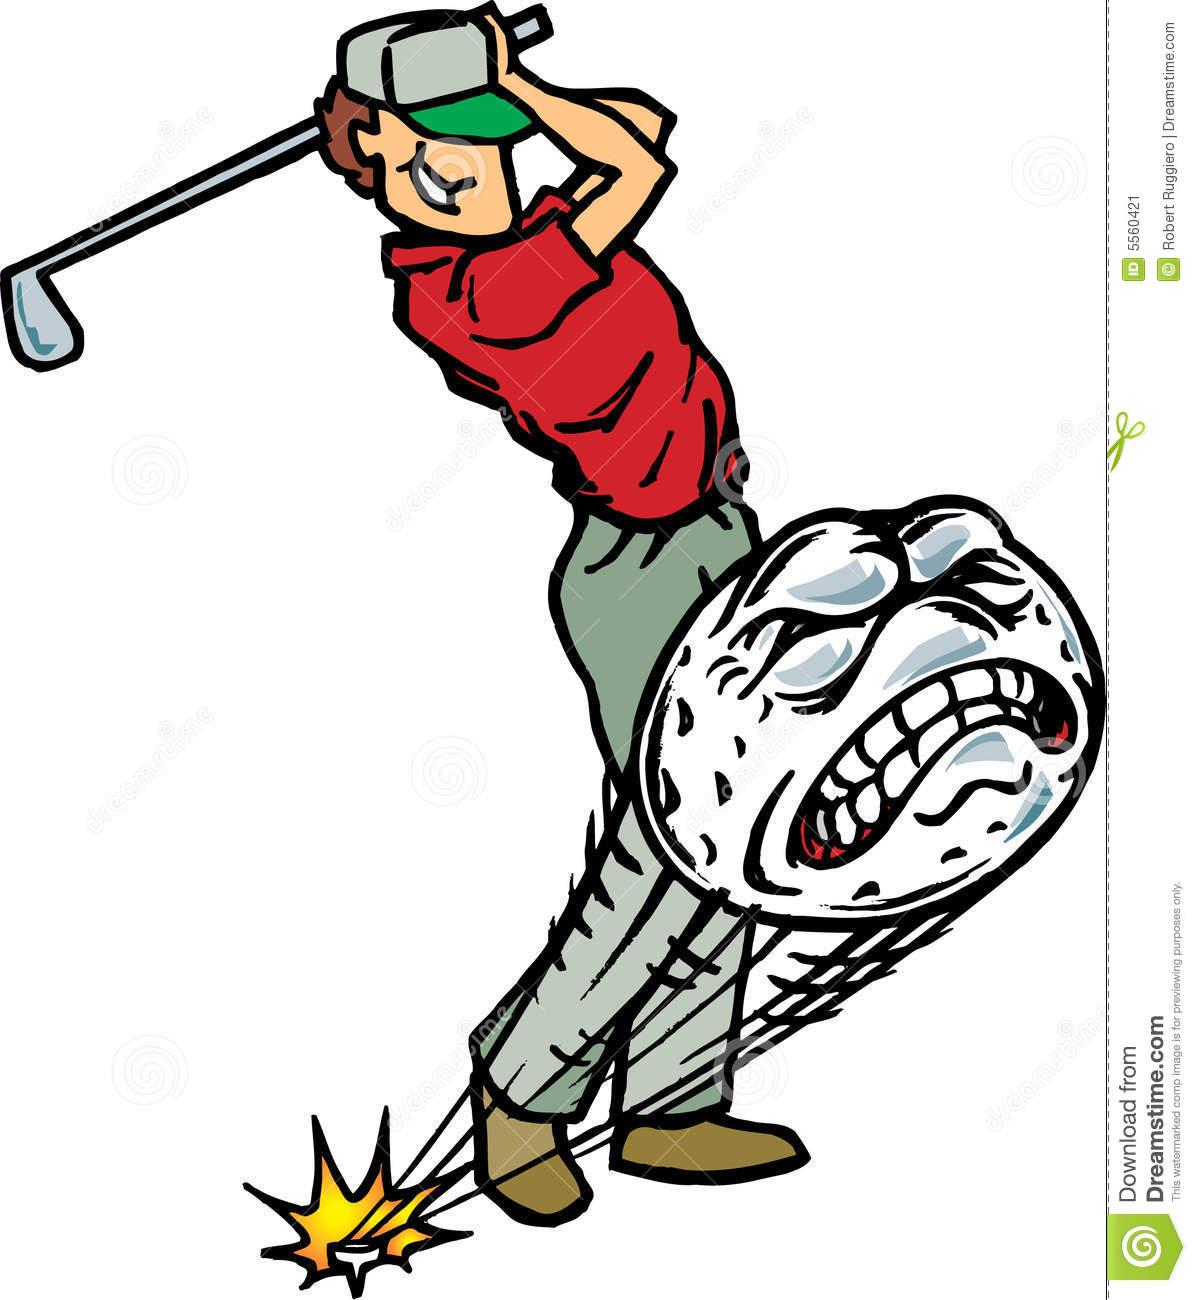 golf-ball-on-tee-clip-art-golfer-hitting-golfball-5560421.jpg